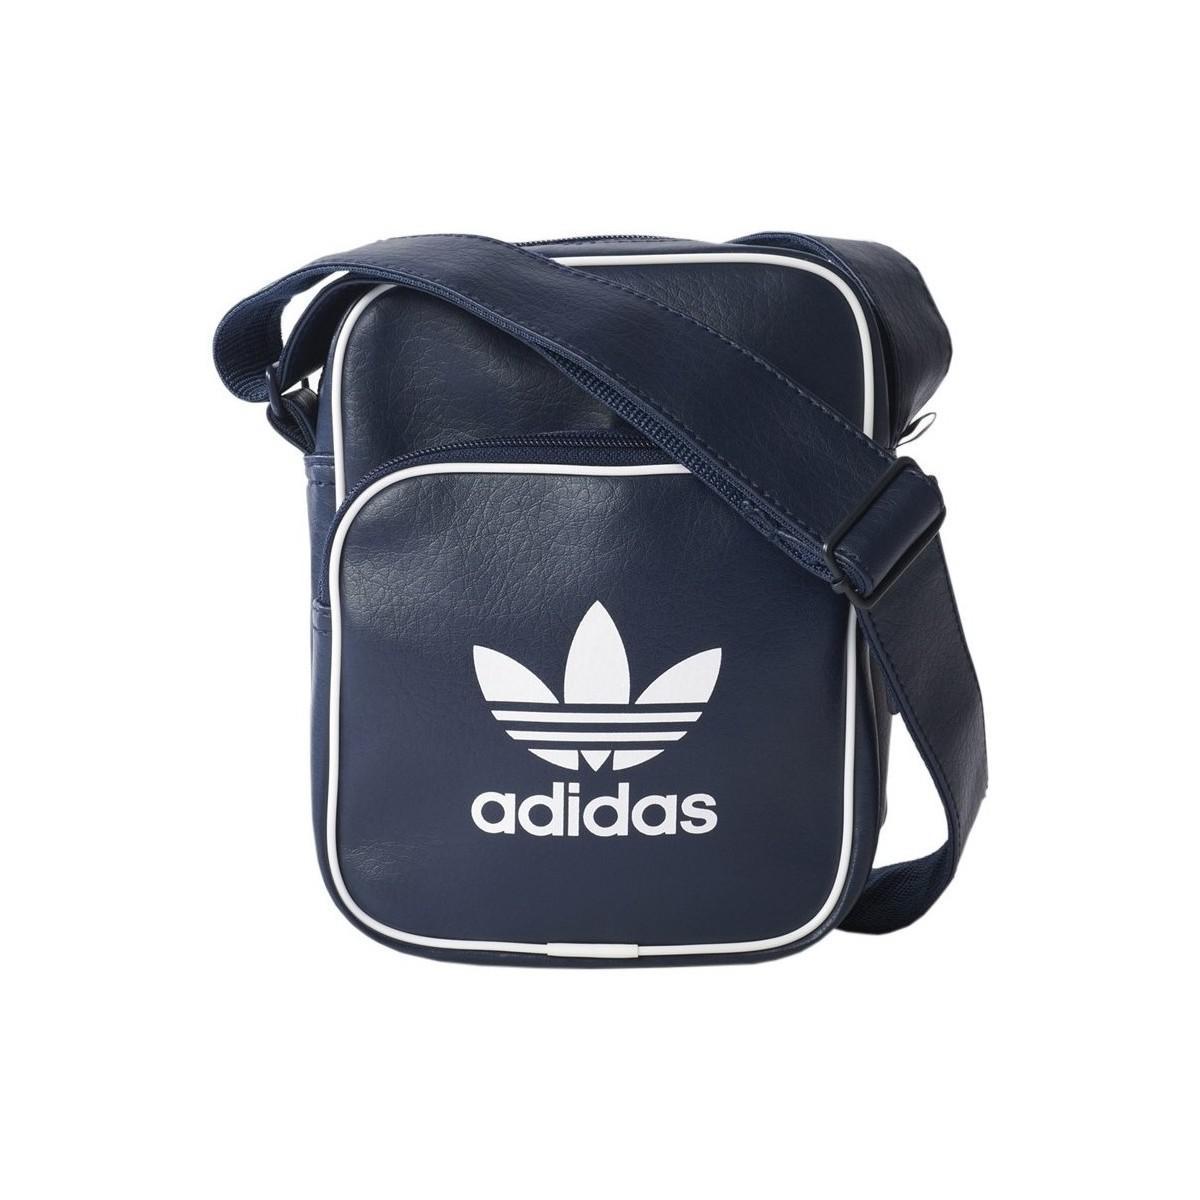 0e405c1065 adidas Classic Bag Mini Men s Messenger Bag In Multicolour in Blue ...